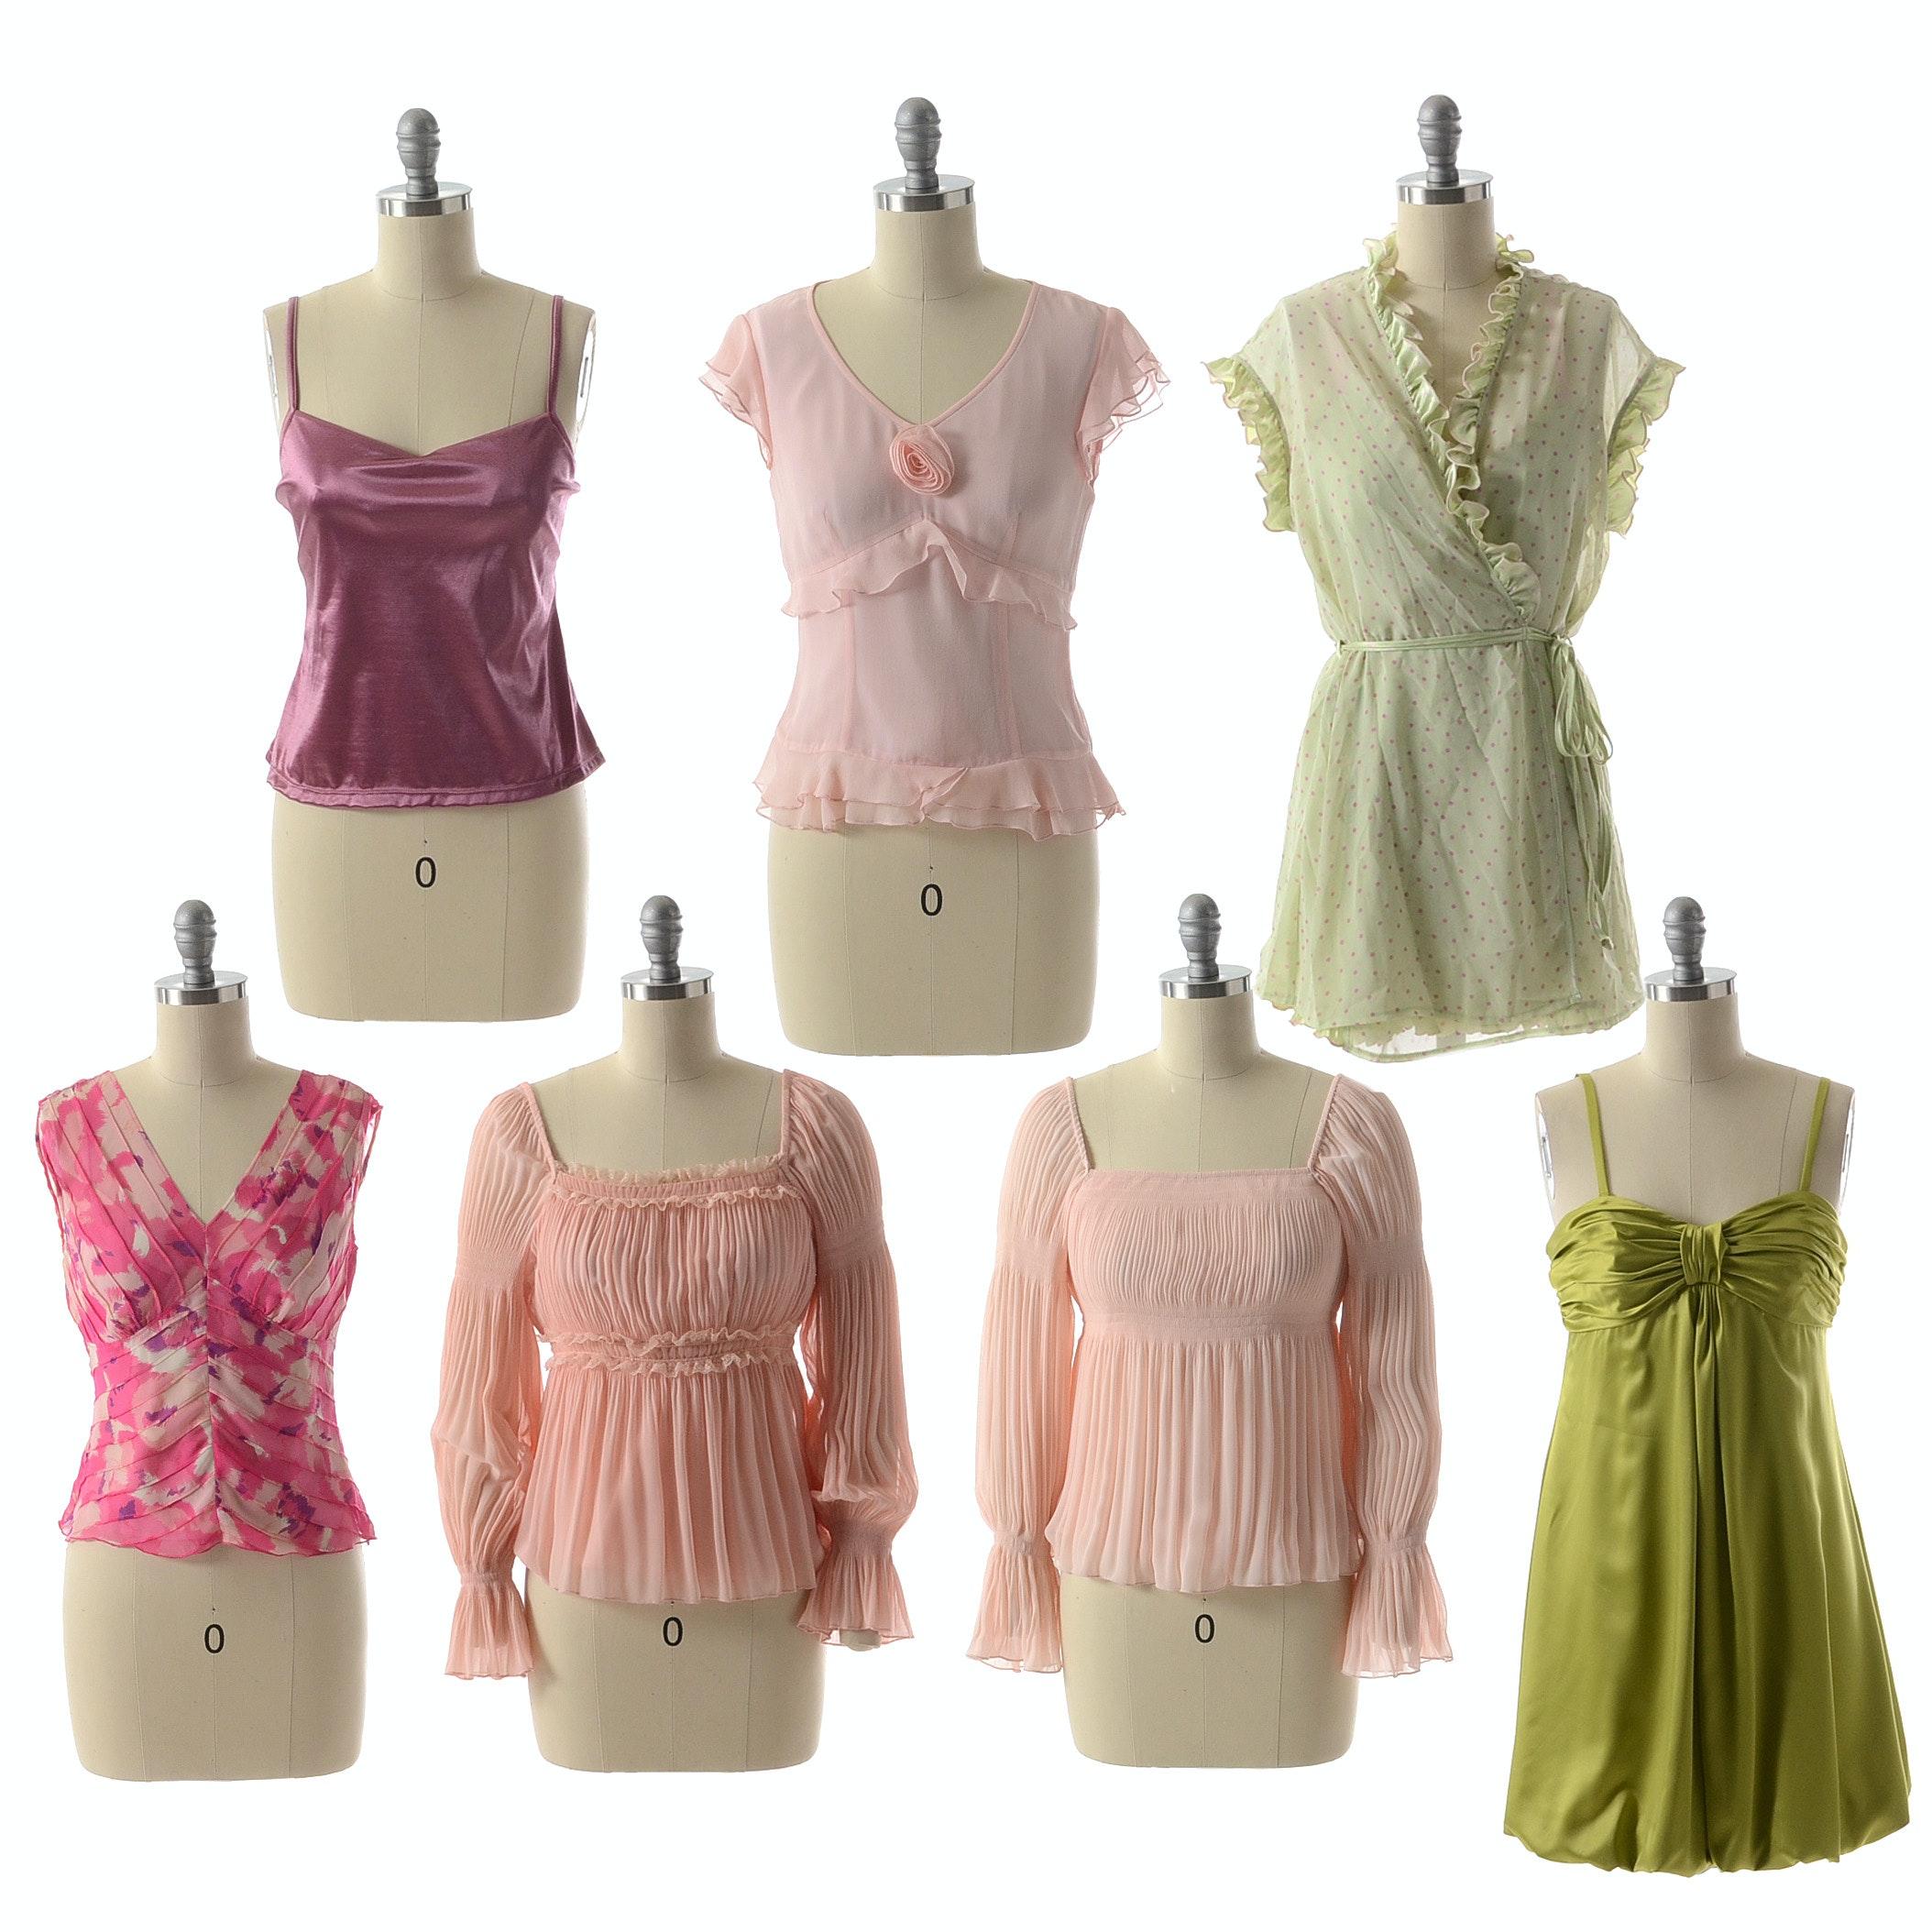 Susan Lucci Brand Tops, Dress, and Peignoir Set